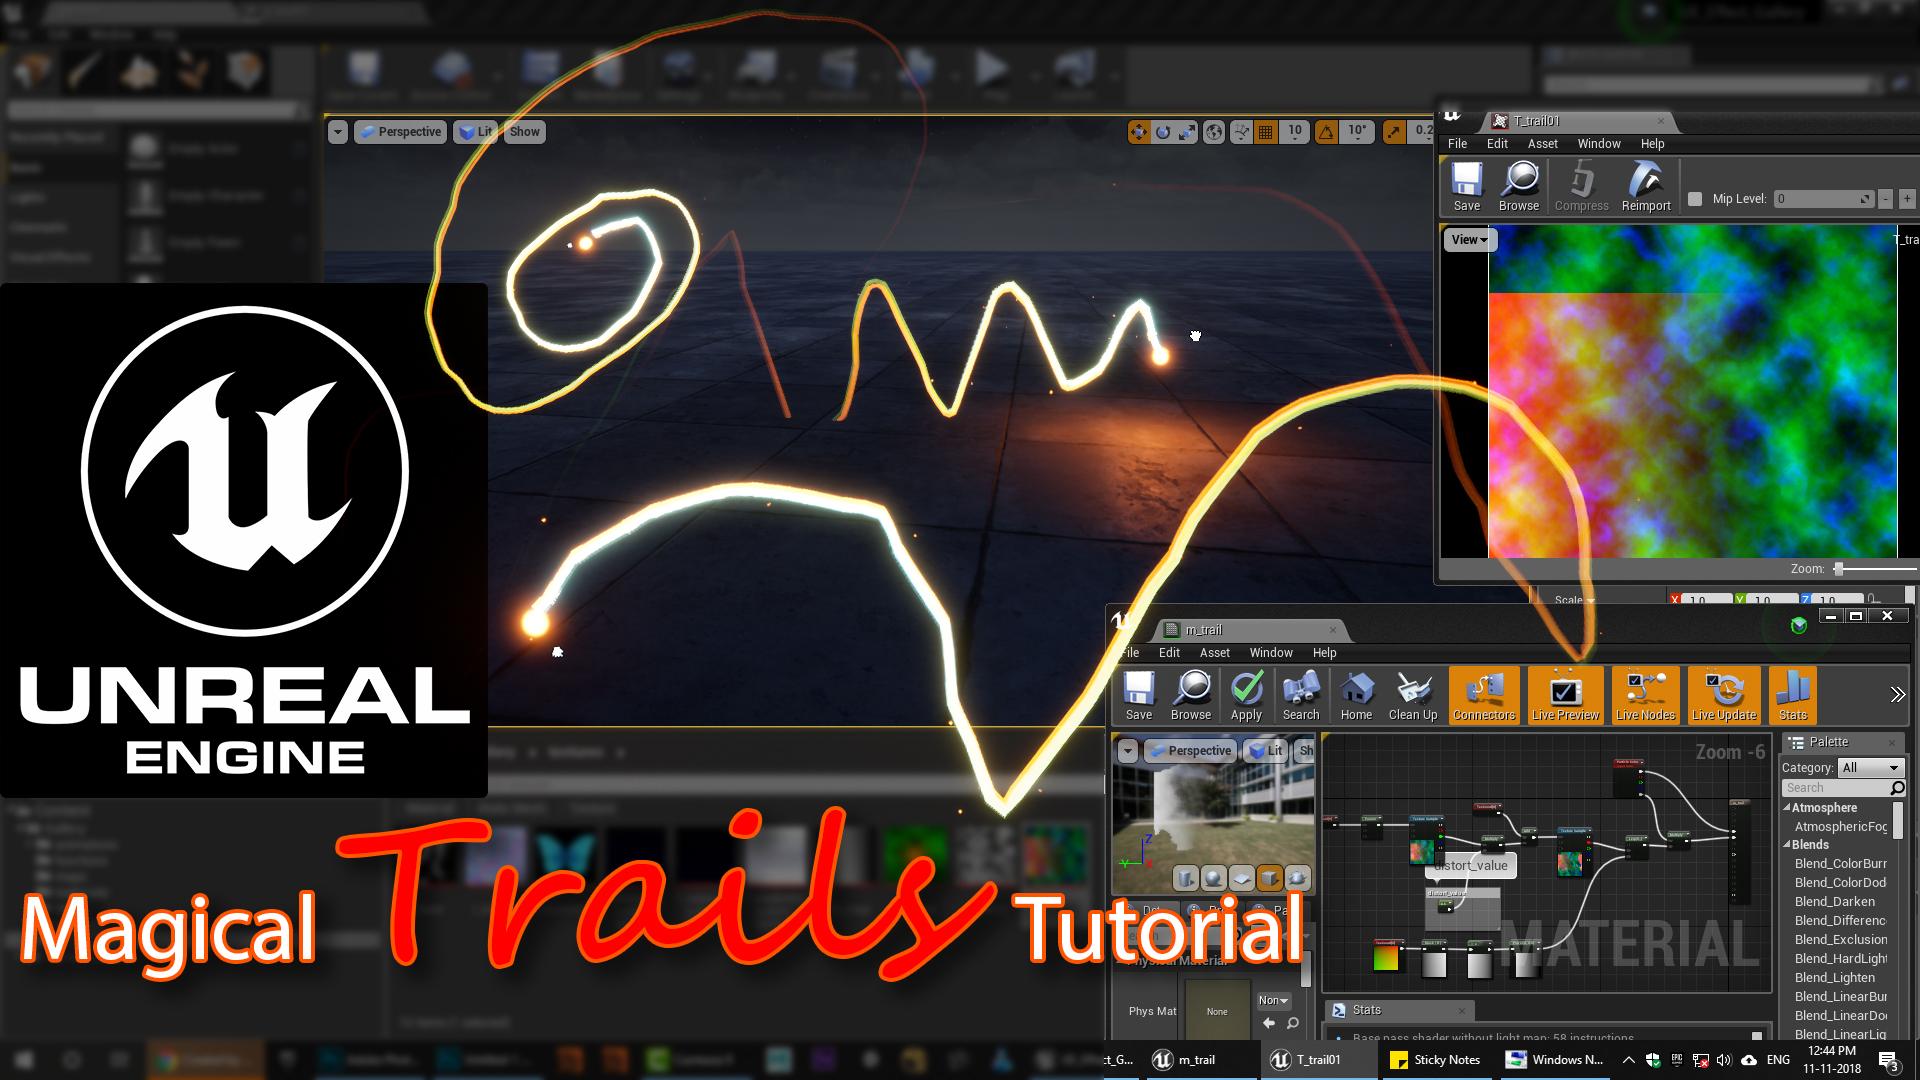 Unreal Engine VFX Tutorials - Real Time VFX